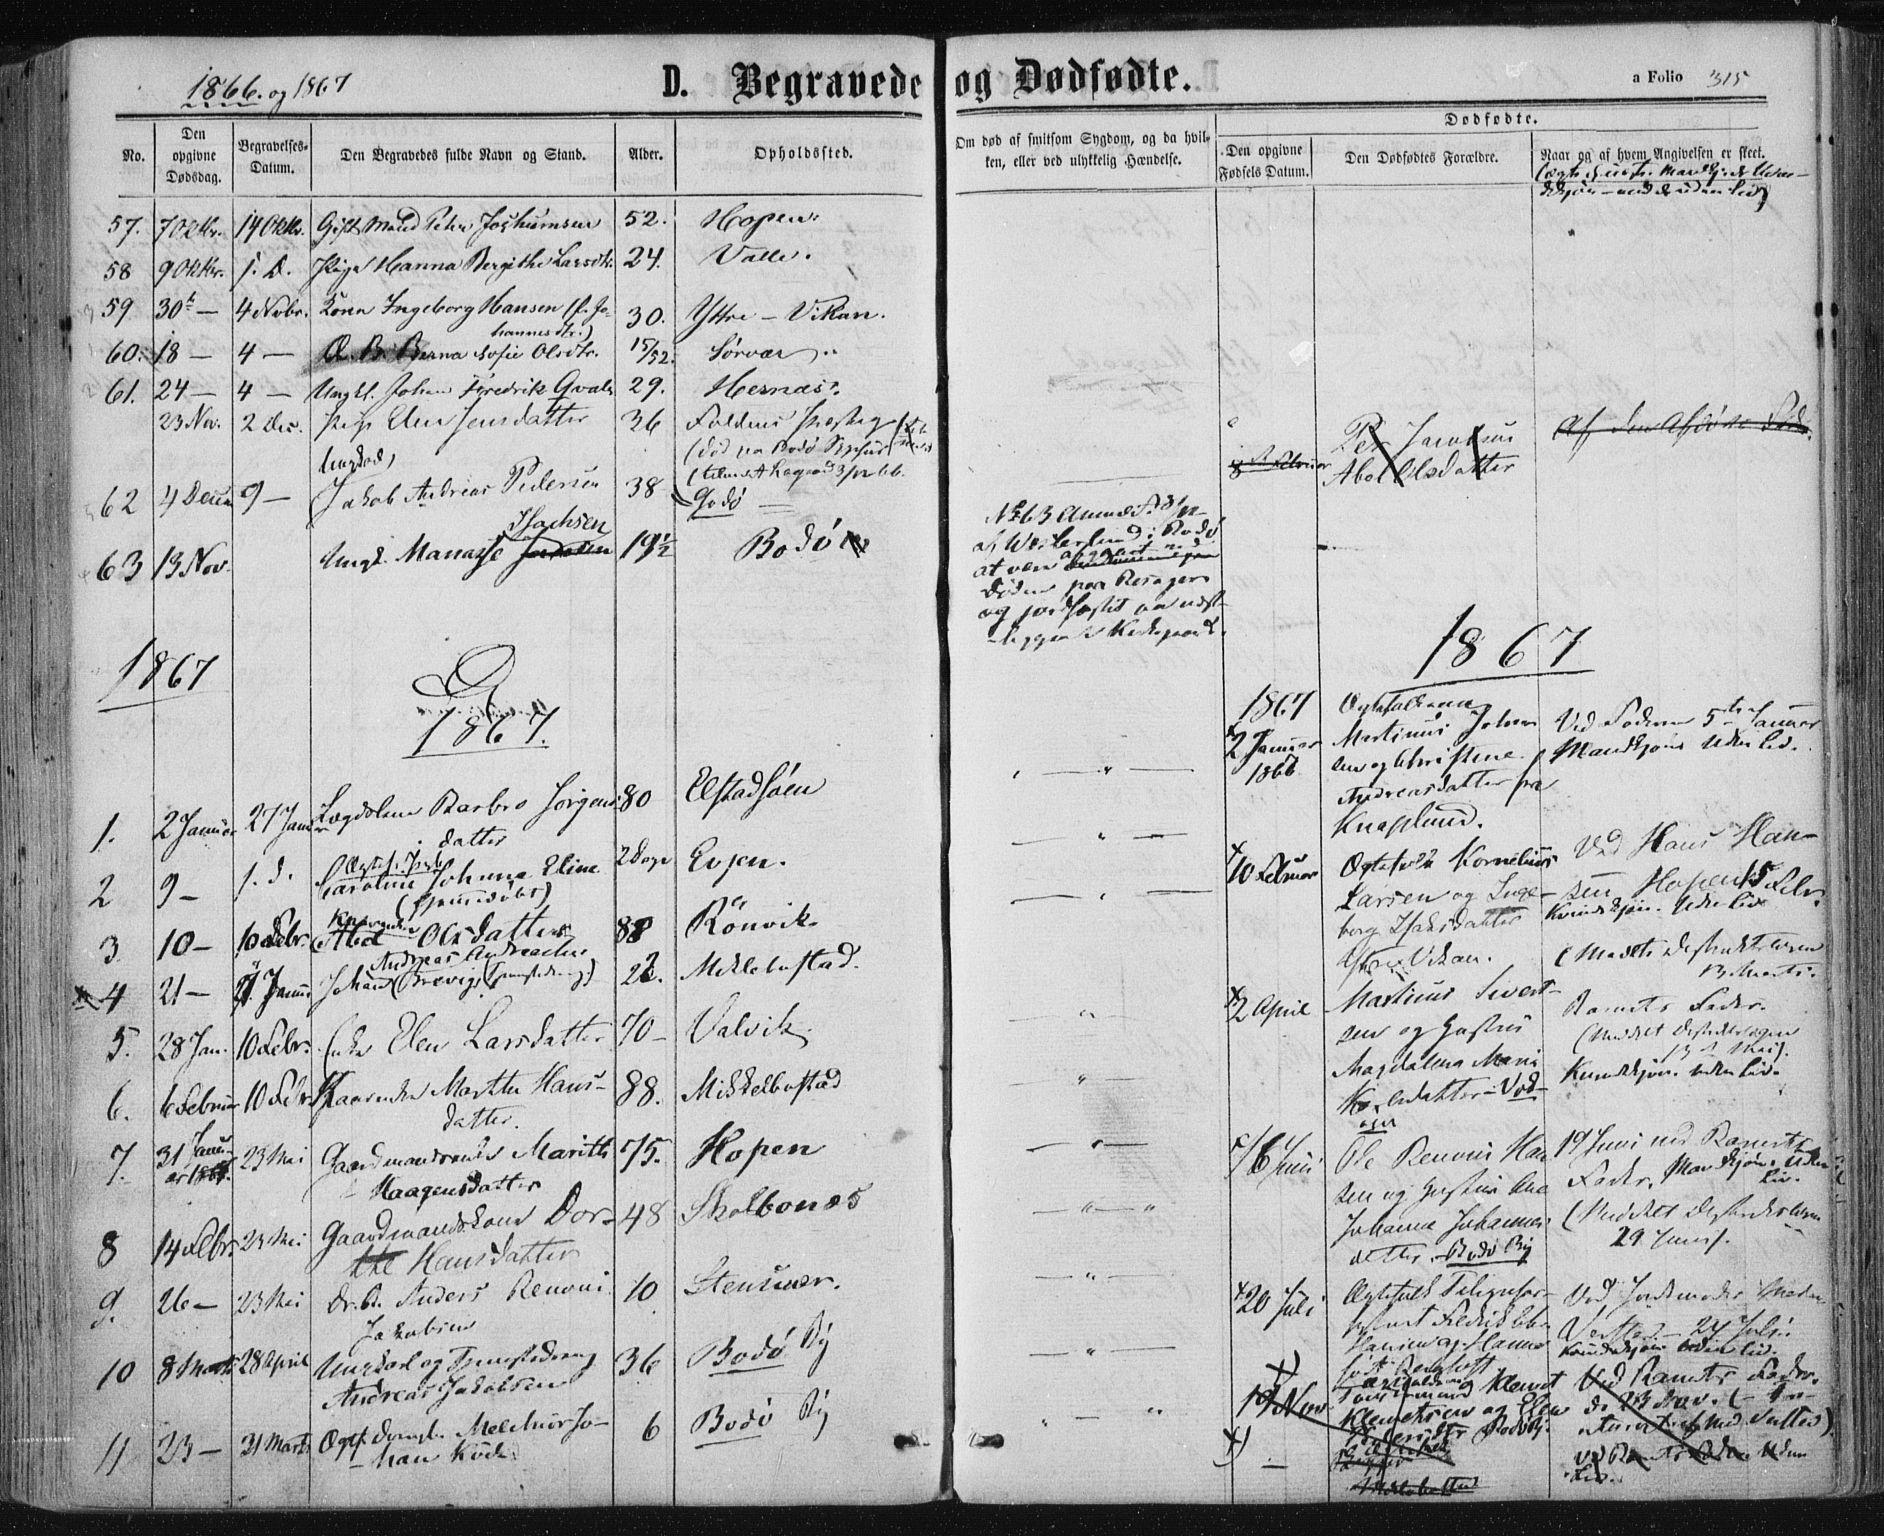 SAT, Ministerialprotokoller, klokkerbøker og fødselsregistre - Nordland, 801/L0008: Ministerialbok nr. 801A08, 1864-1875, s. 315